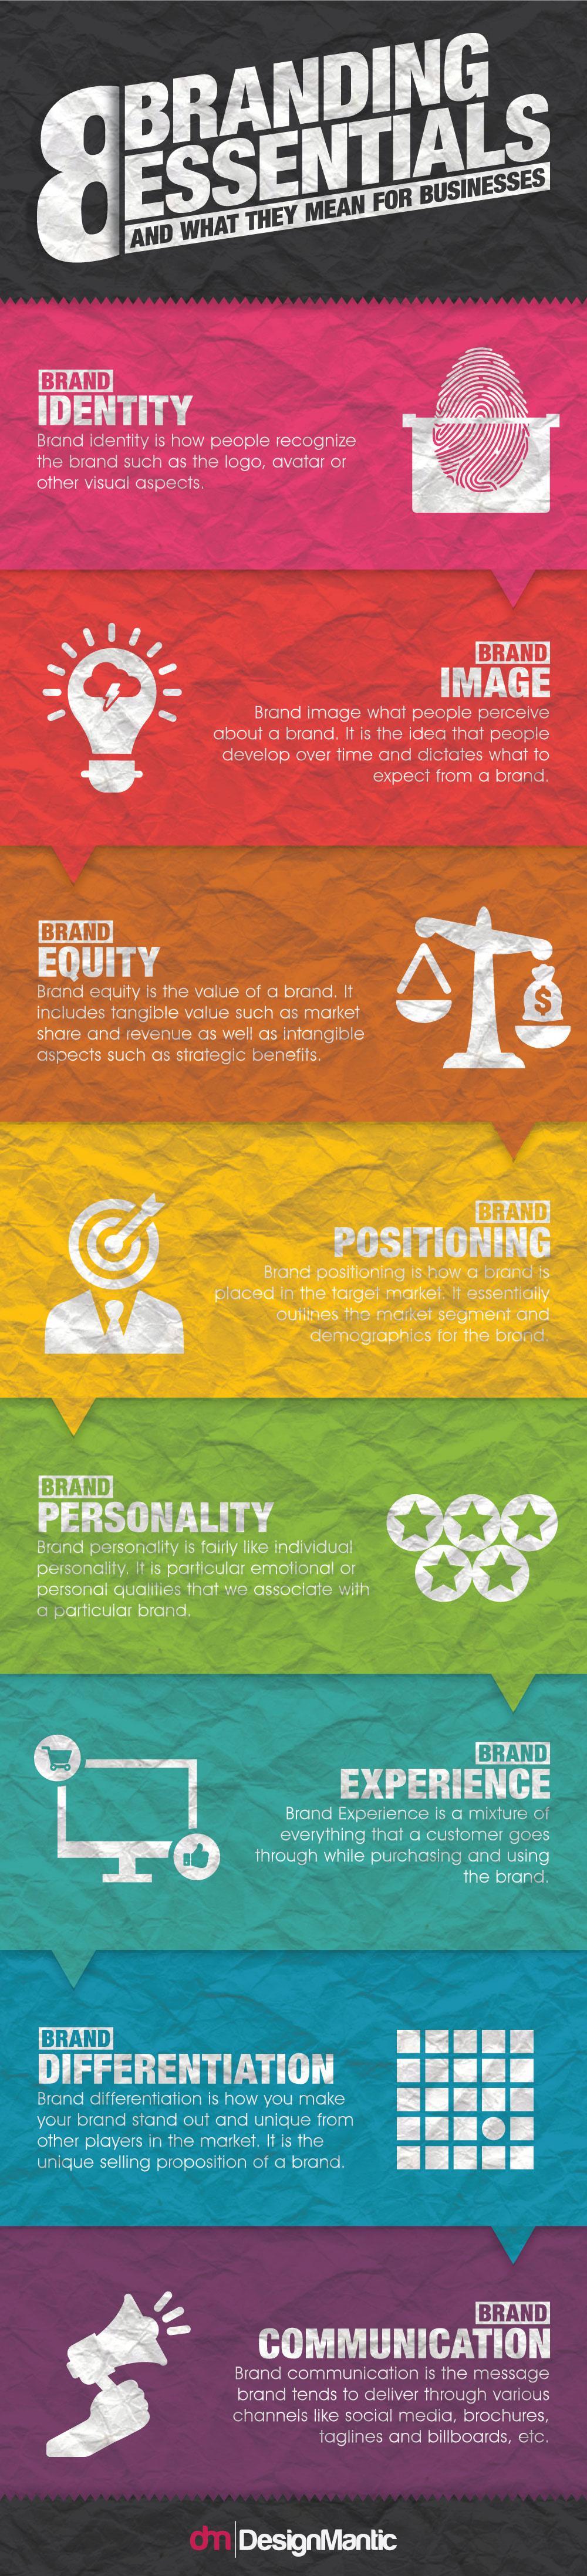 branding essentials for businesses